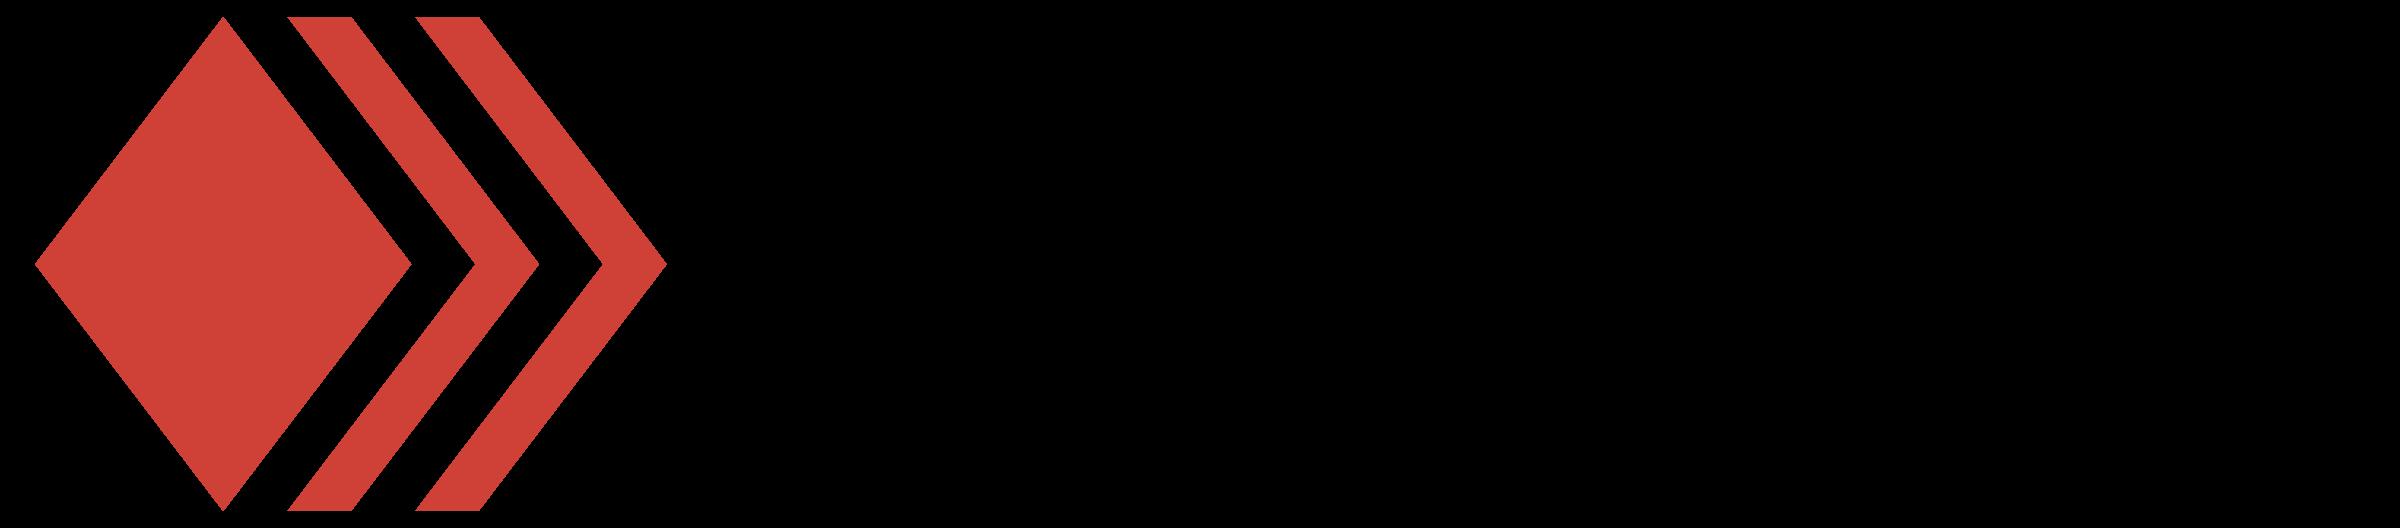 Paroc